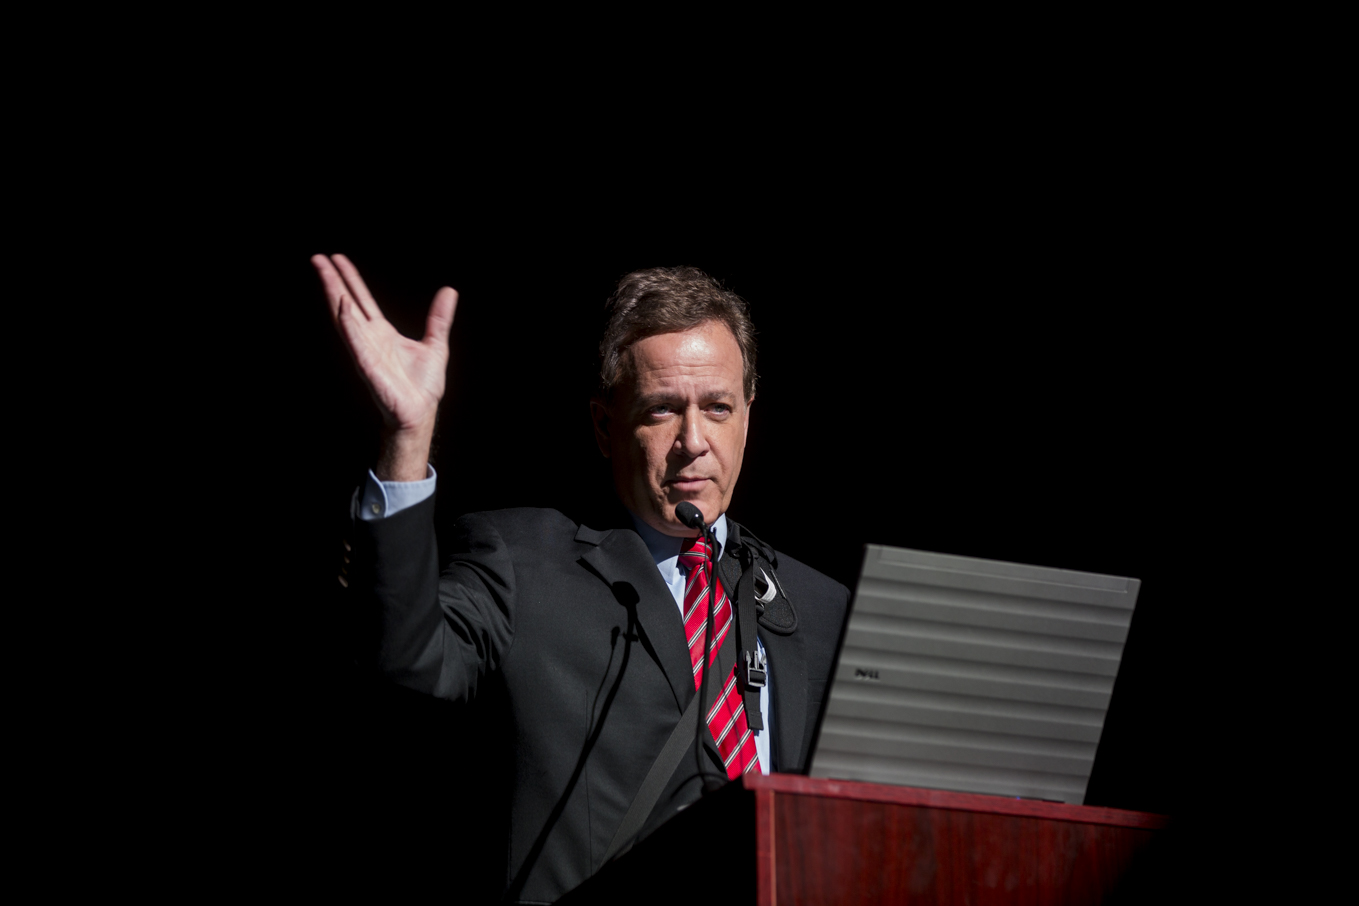 News 4 San Antonio anchor Randy Beamer introduces the PechaKucha 23 speakers.